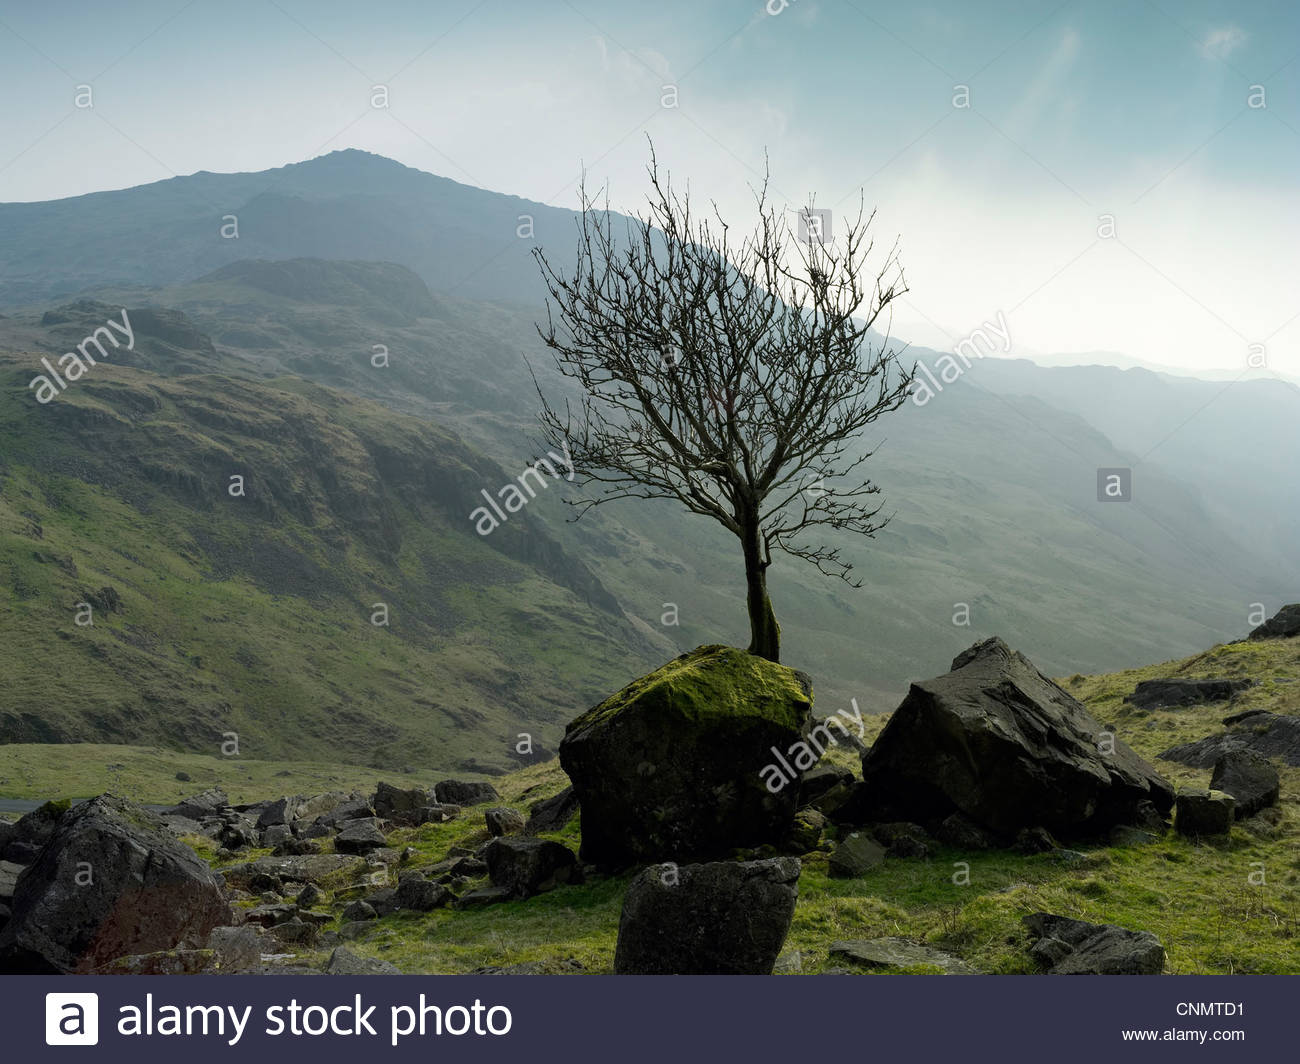 Tree growing in rocky rural landscape - Stock Image